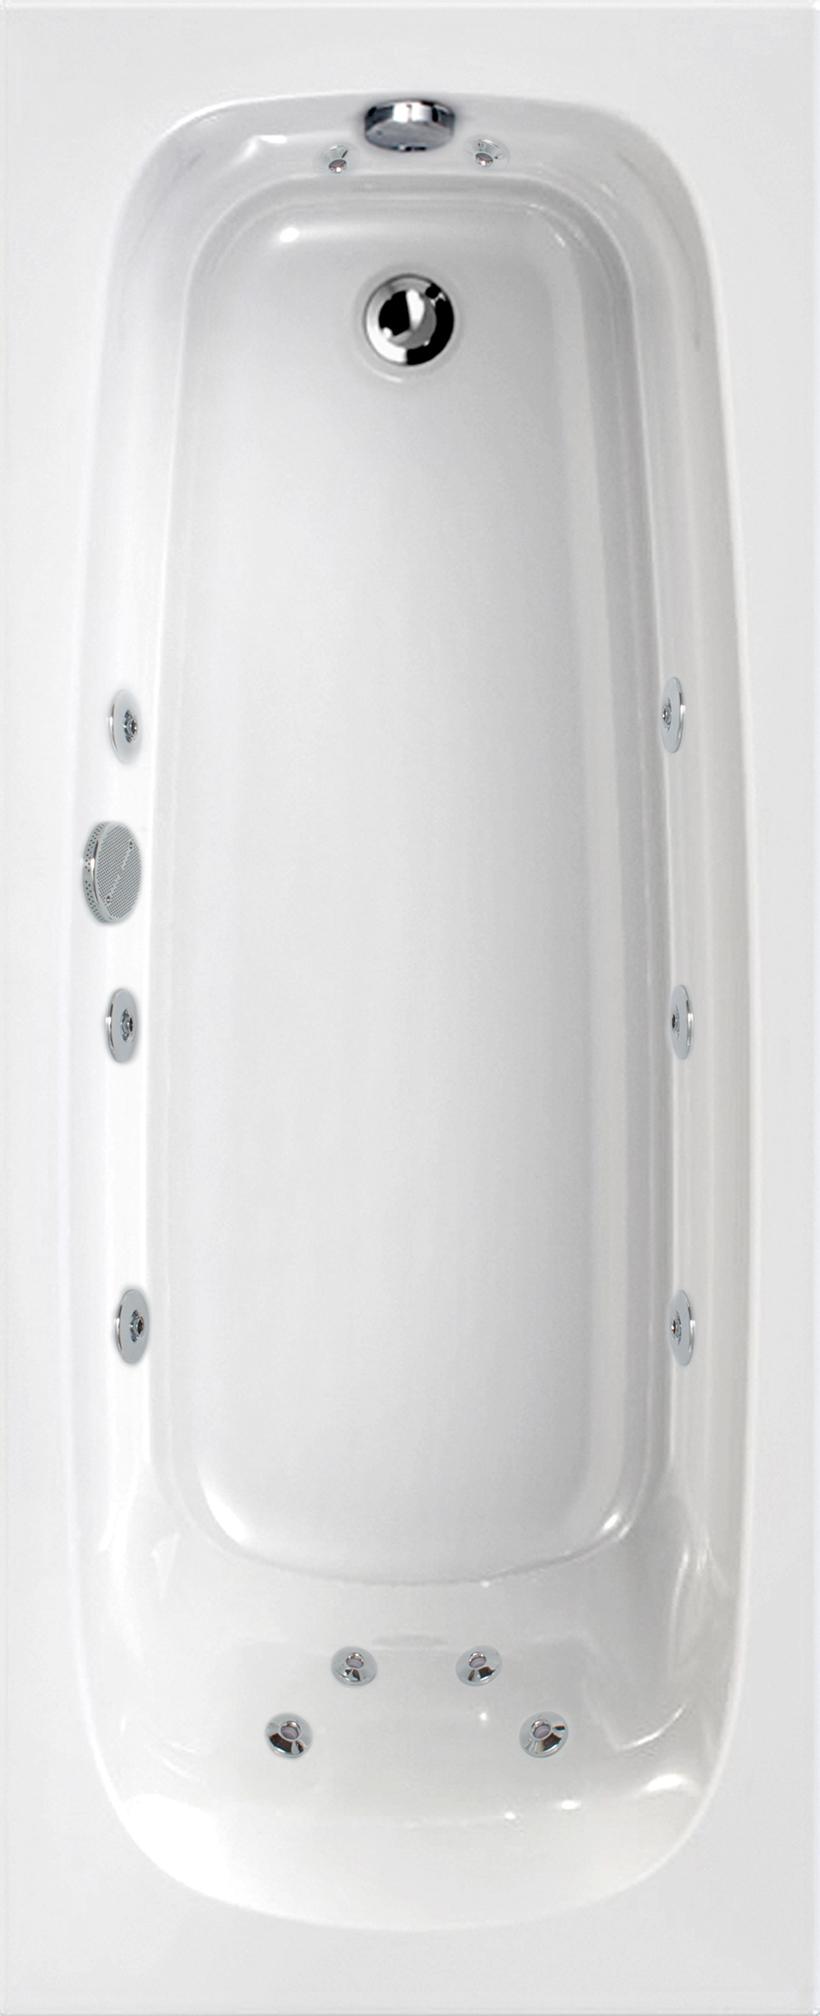 Mercury 1700x700 Single Ended 12 Jet Whirlpool Bath